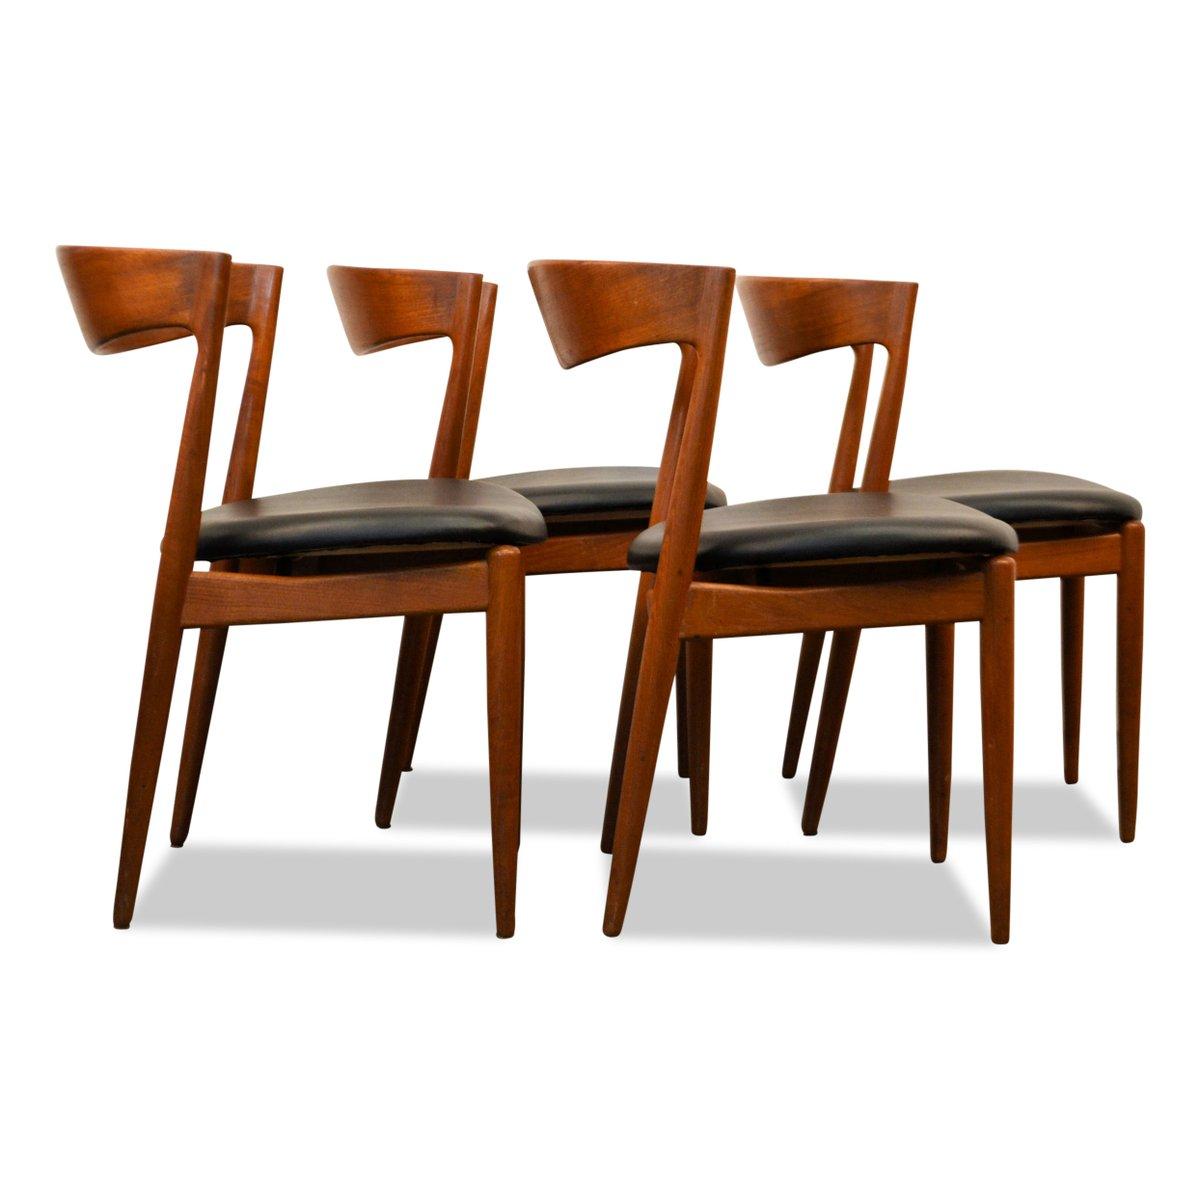 mid century dining chair mid century teak wood chairs modern  - midcentury danish dining chairs from bramin s set of